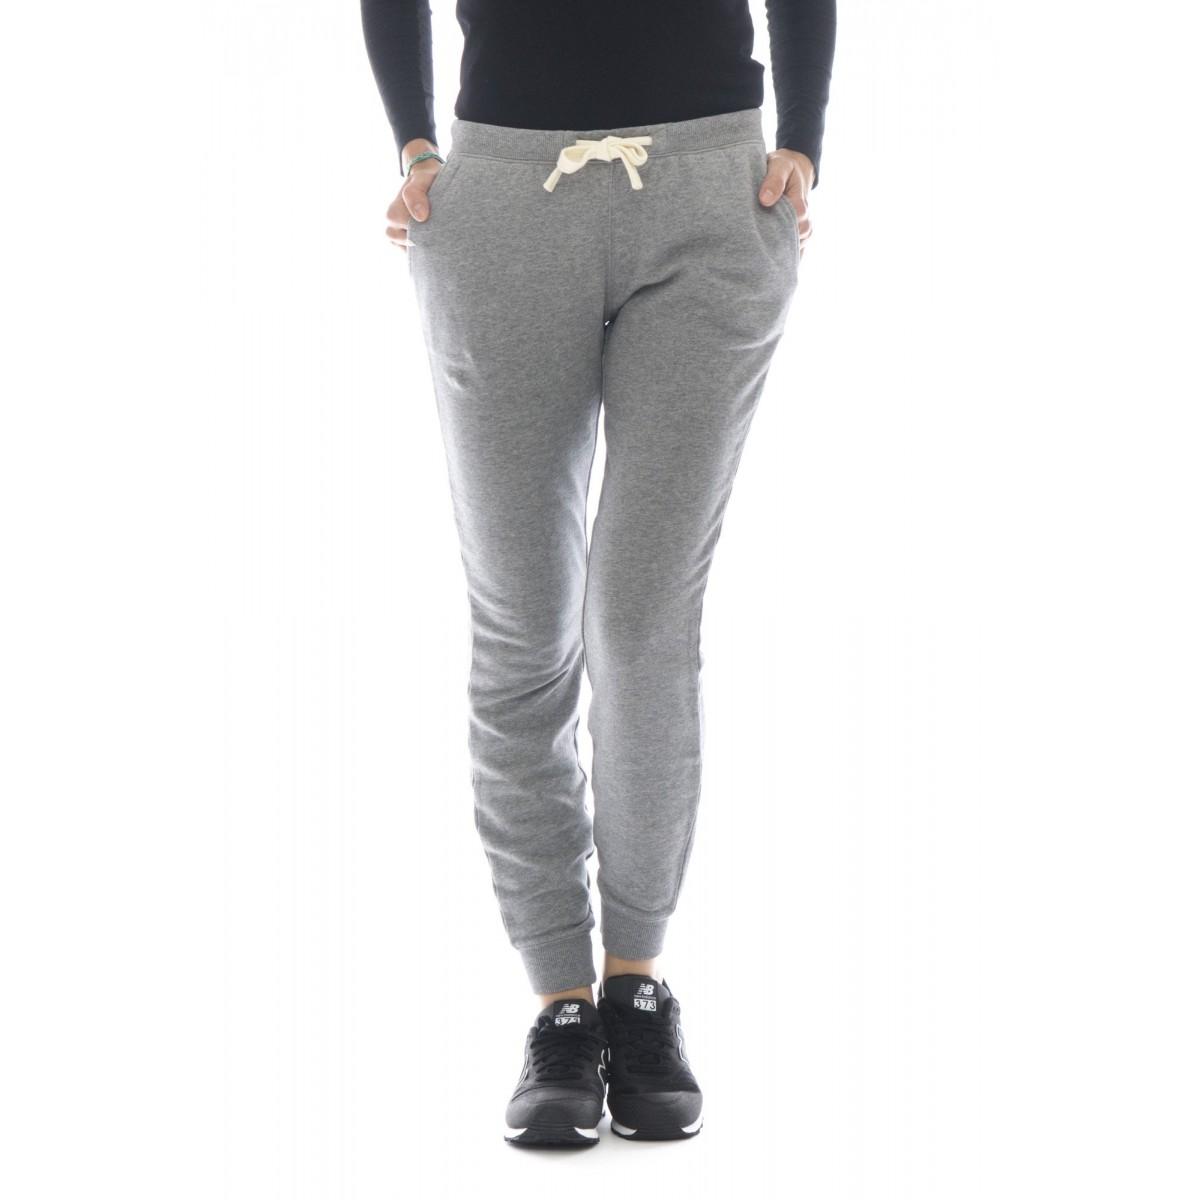 Pantalone donna - 27221 pantalone tuta jogging